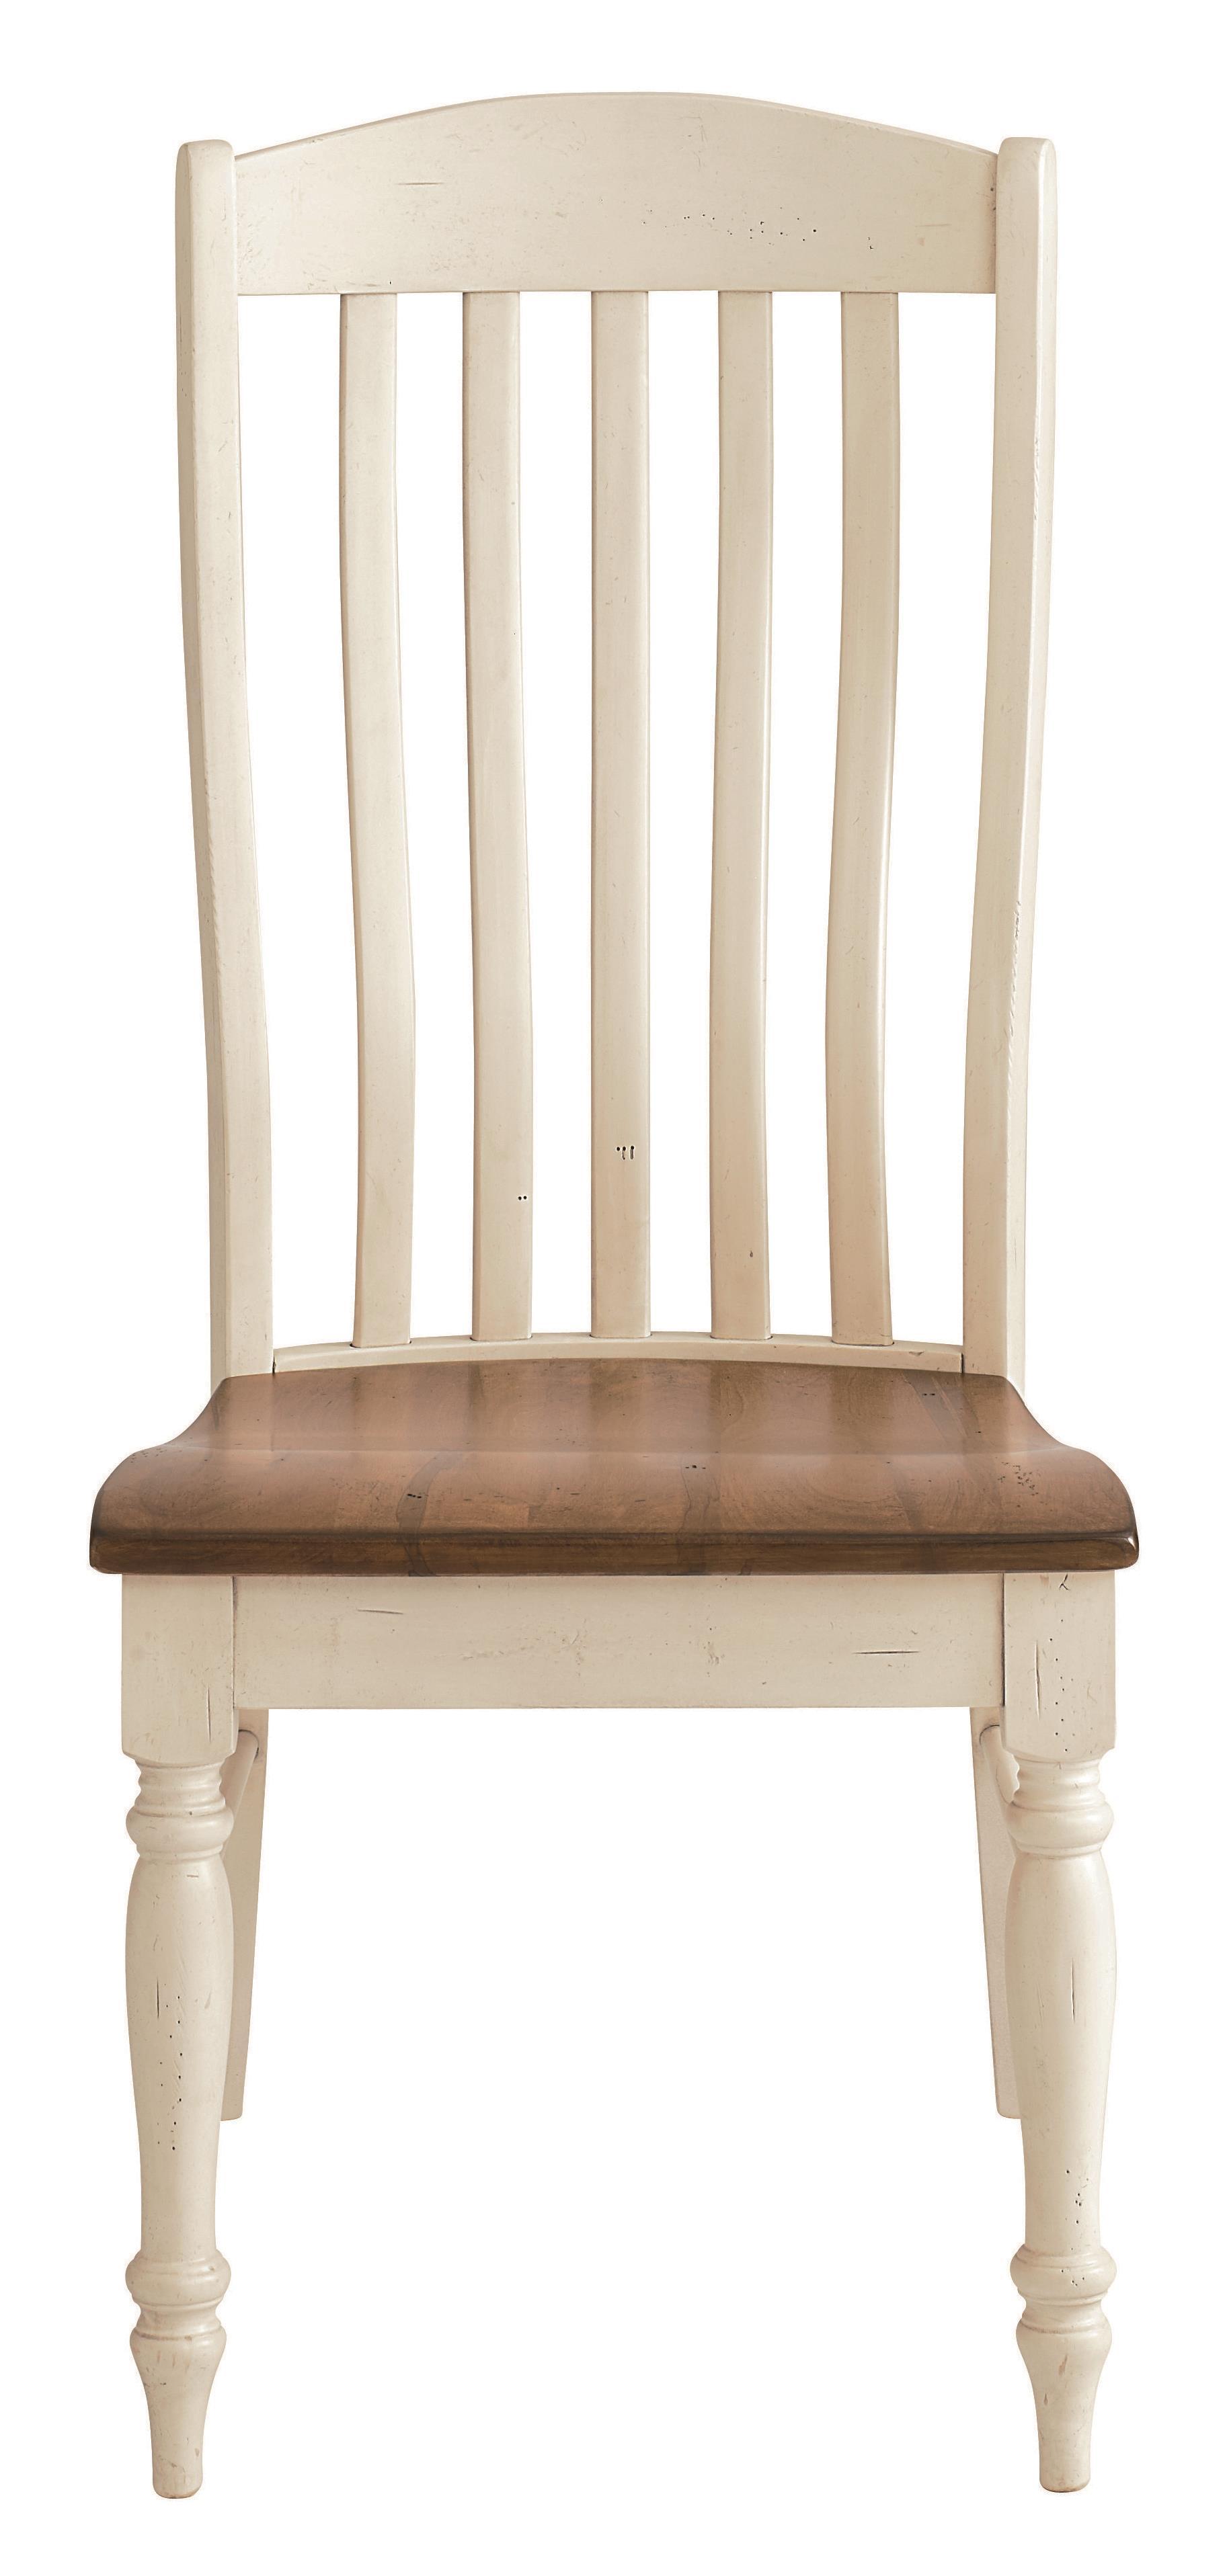 Bench Made Maple Henry Side Chair by Bassett at Bassett of Cool Springs